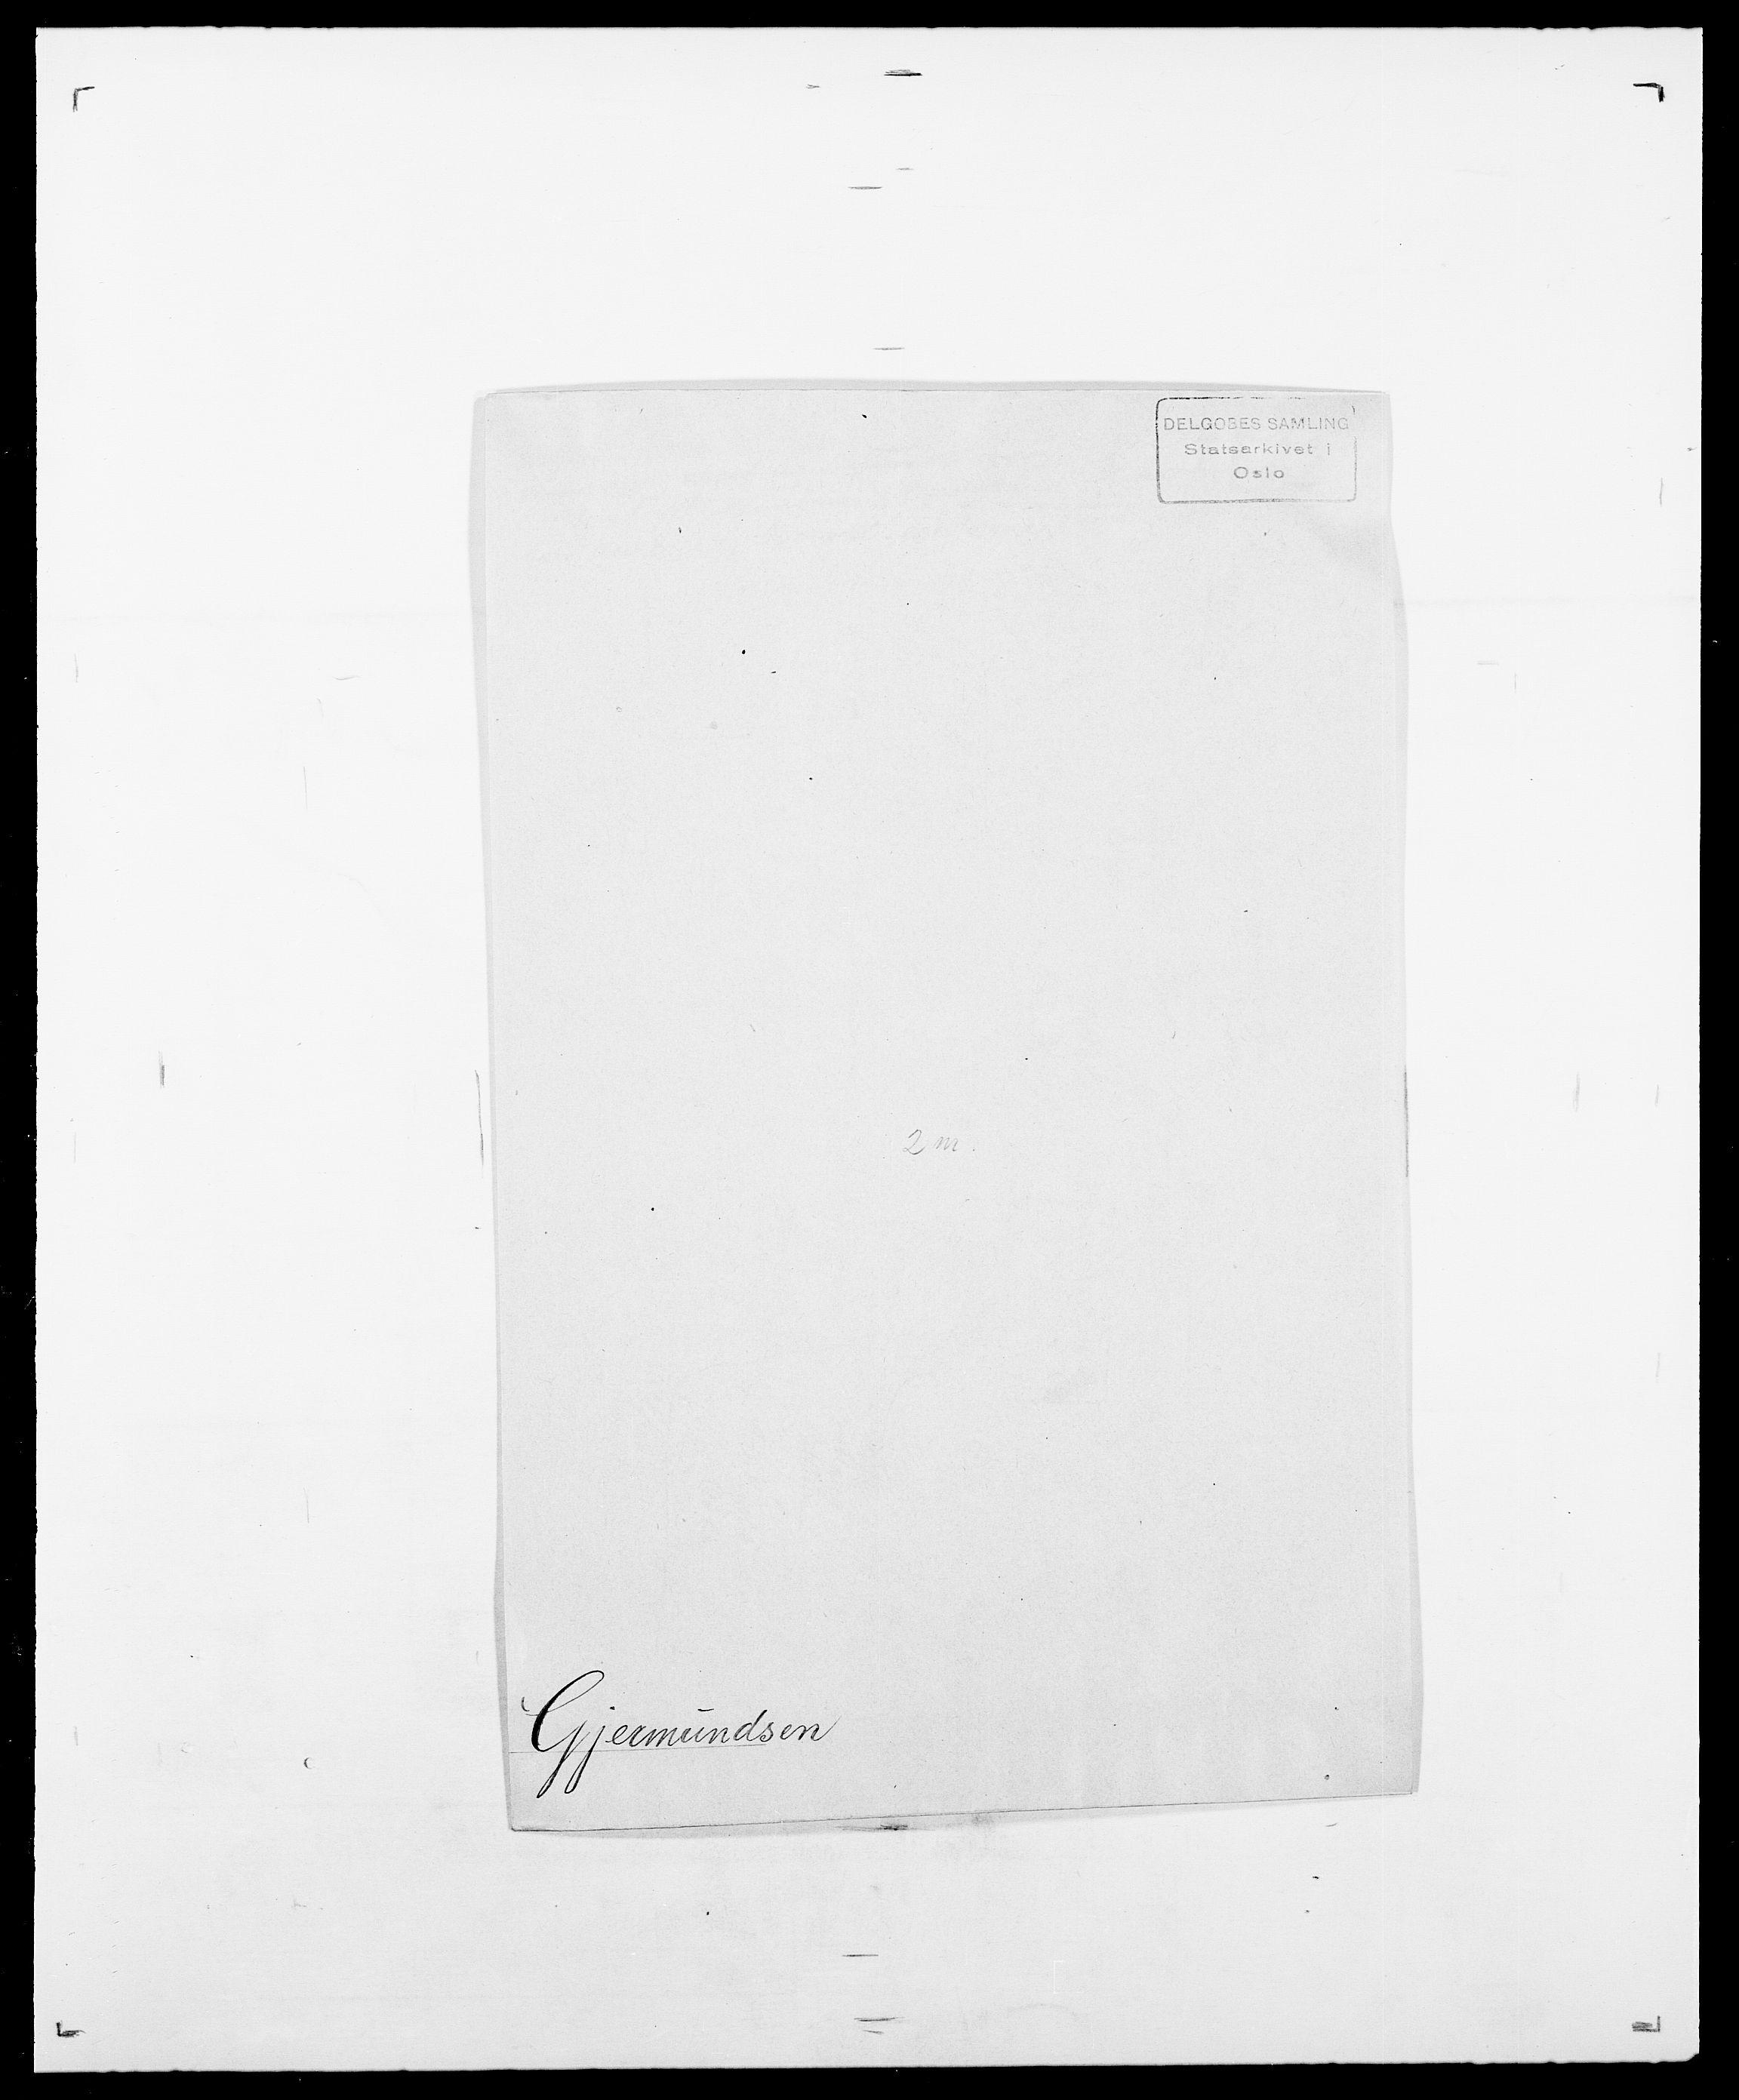 SAO, Delgobe, Charles Antoine - samling, D/Da/L0014: Giebdhausen - Grip, s. 146